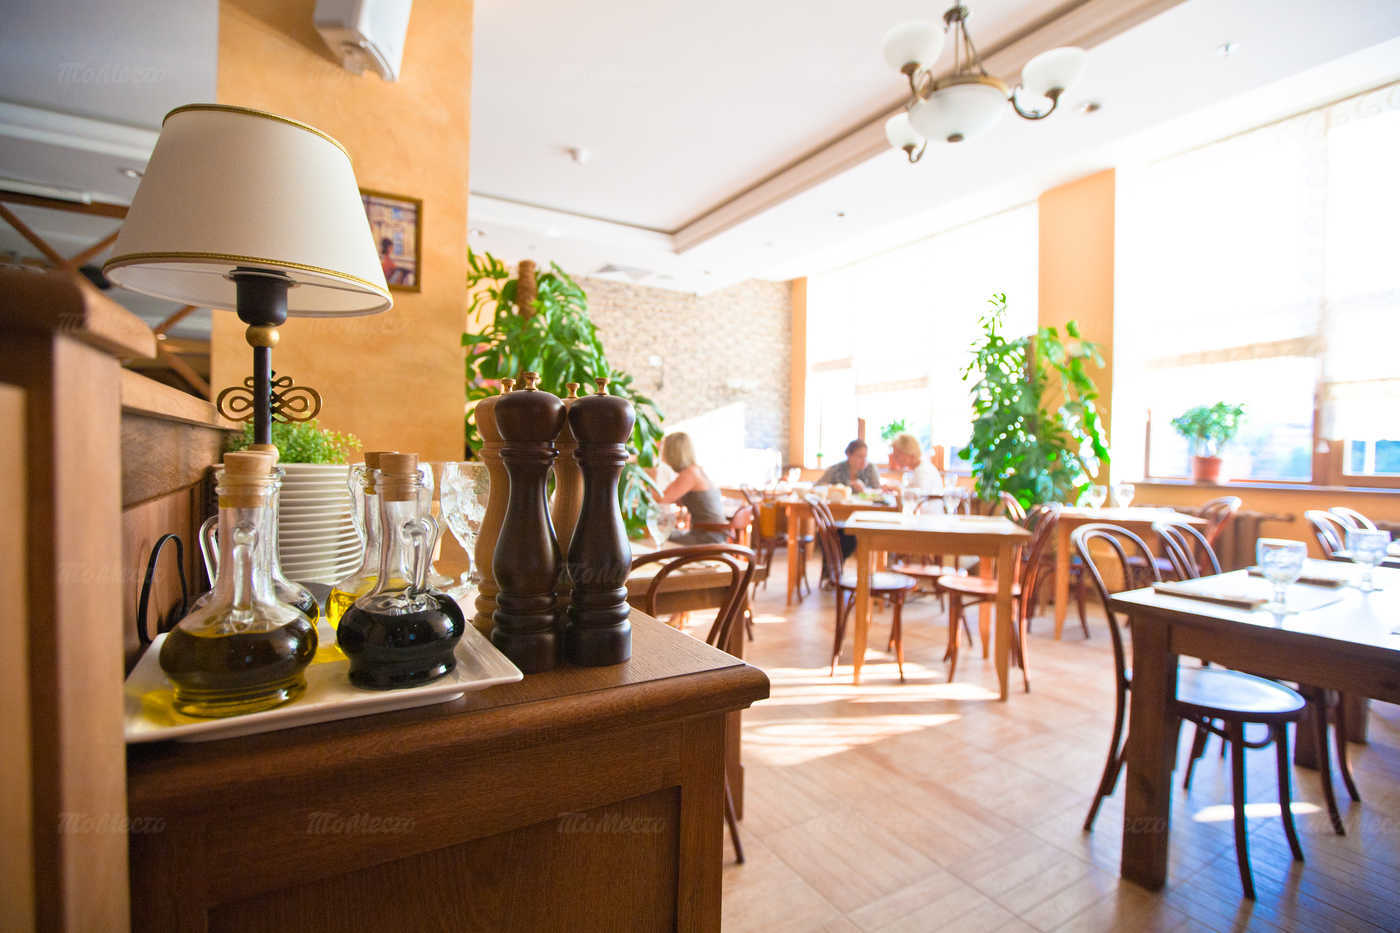 Меню ресторана Фан Флан (Fanflan) на Коломяжском проспекте